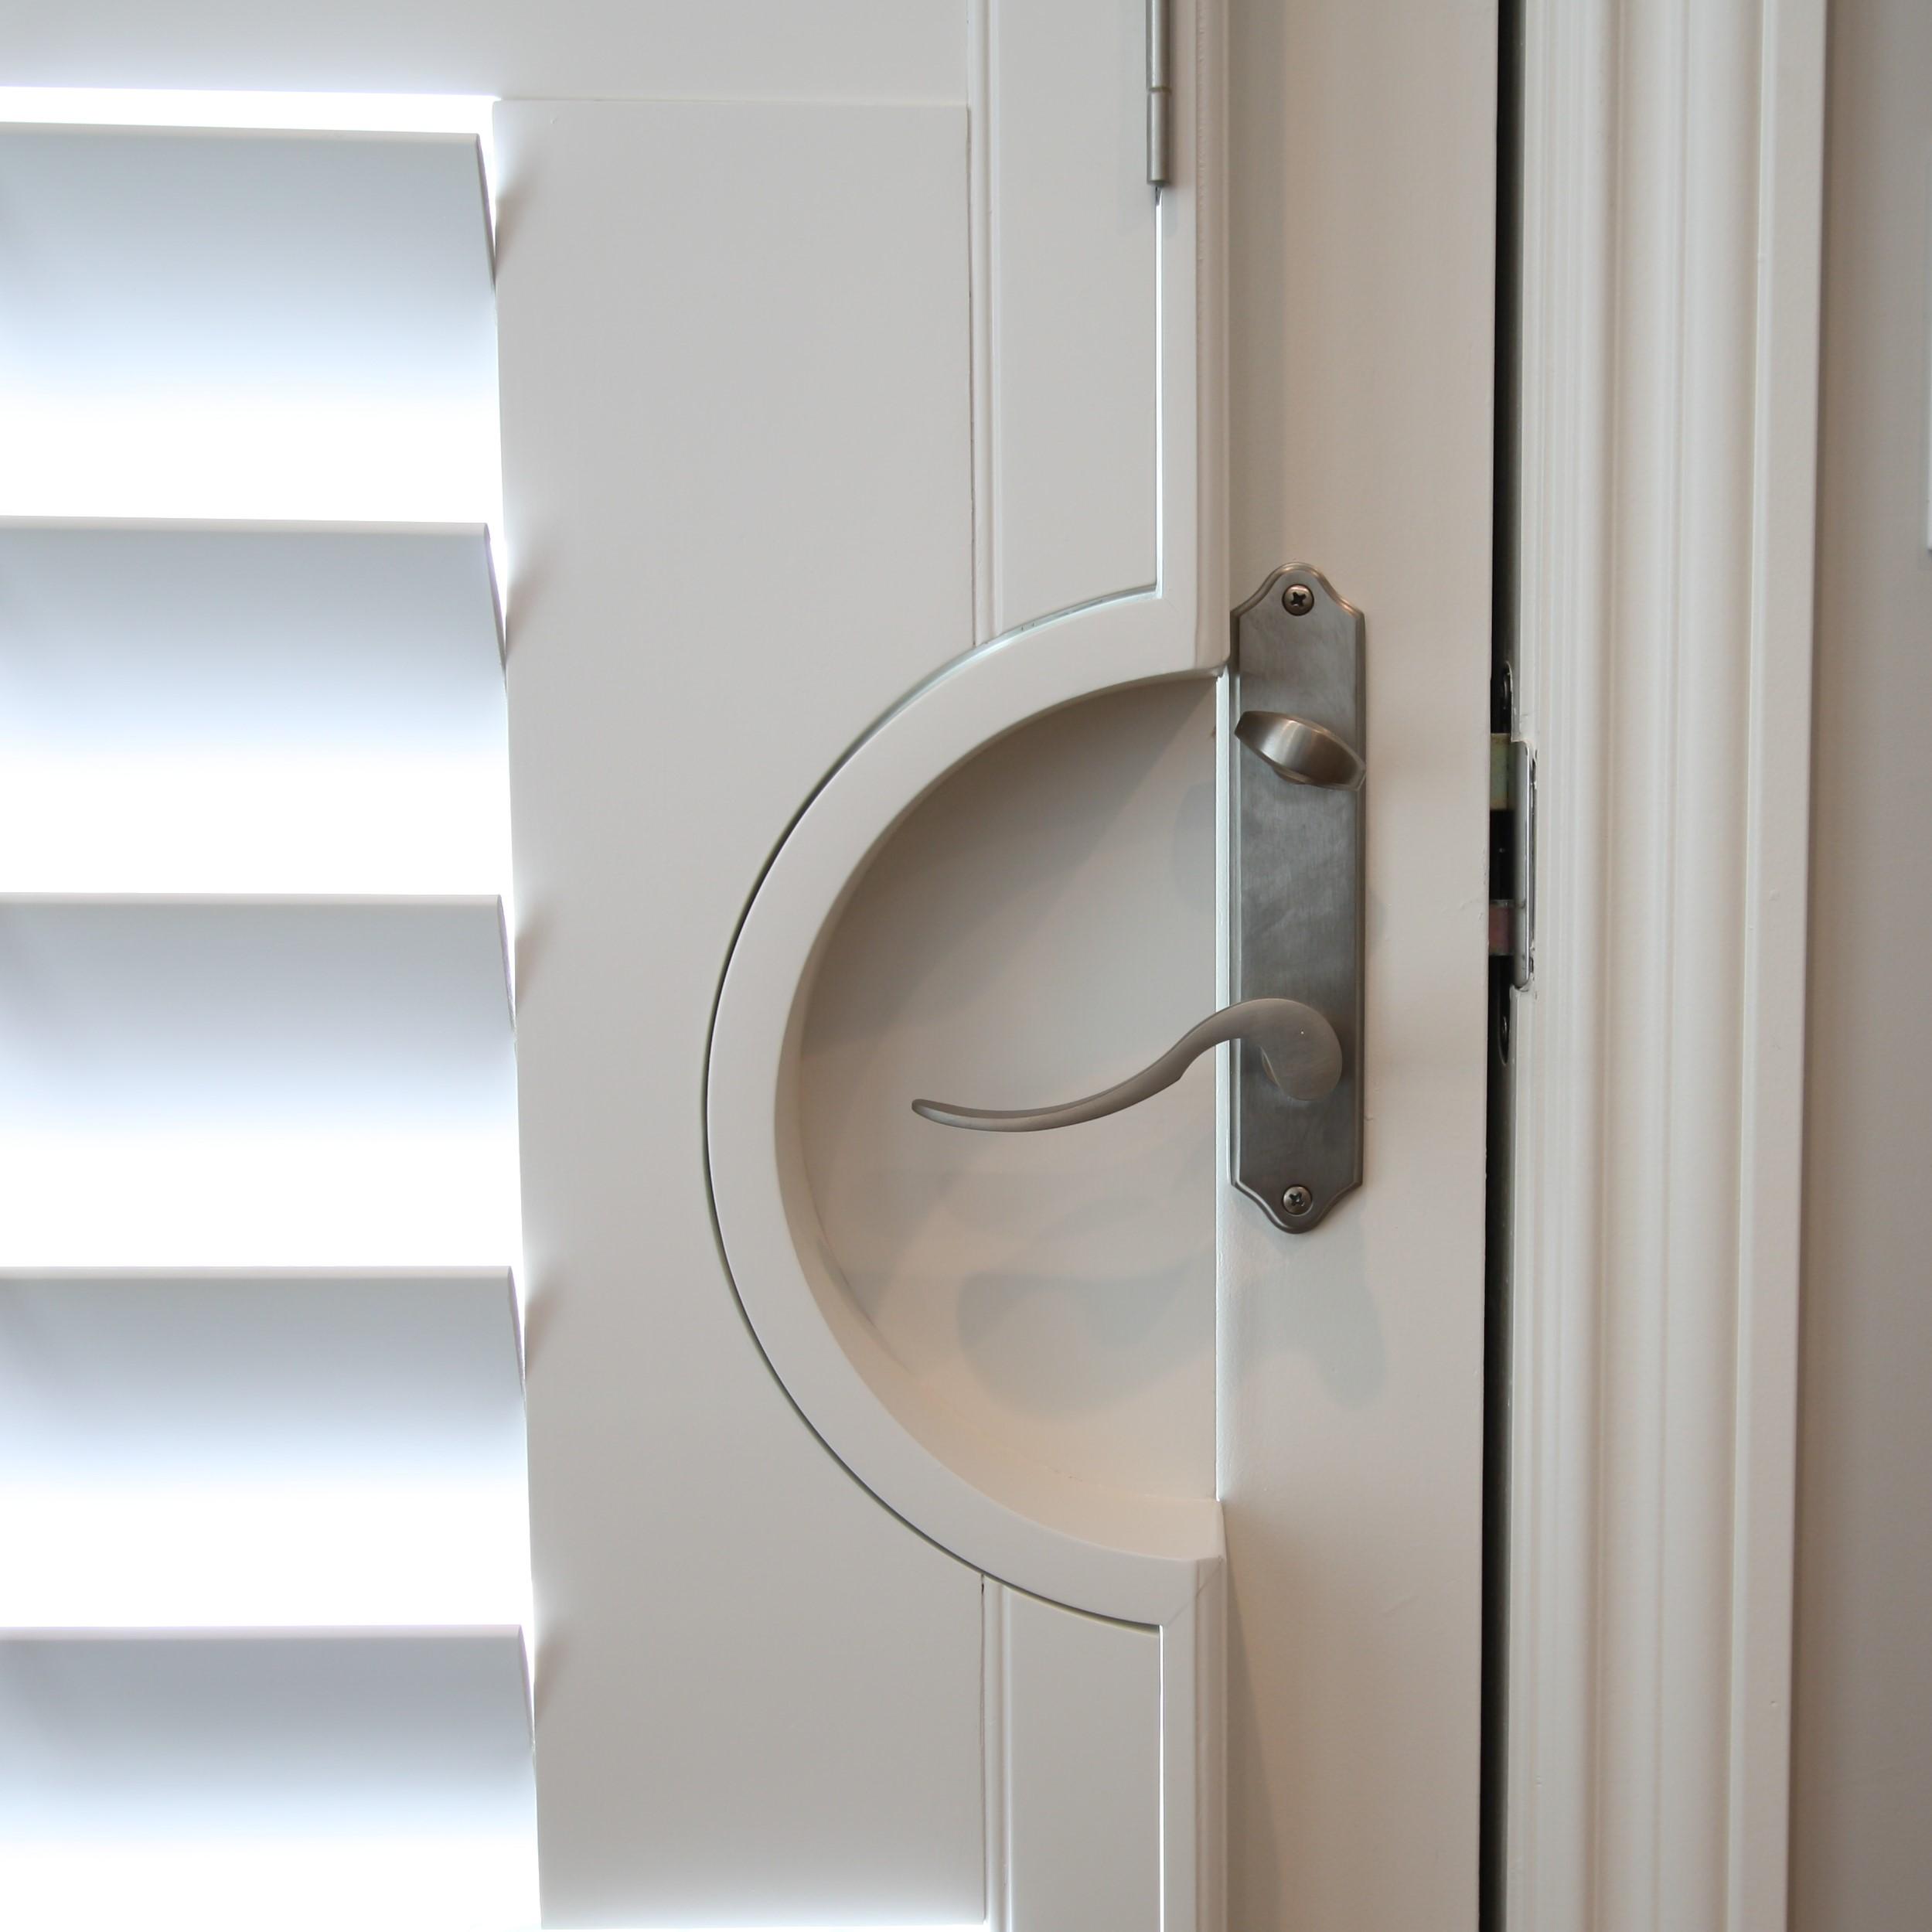 Shutter with door notch for lever handle